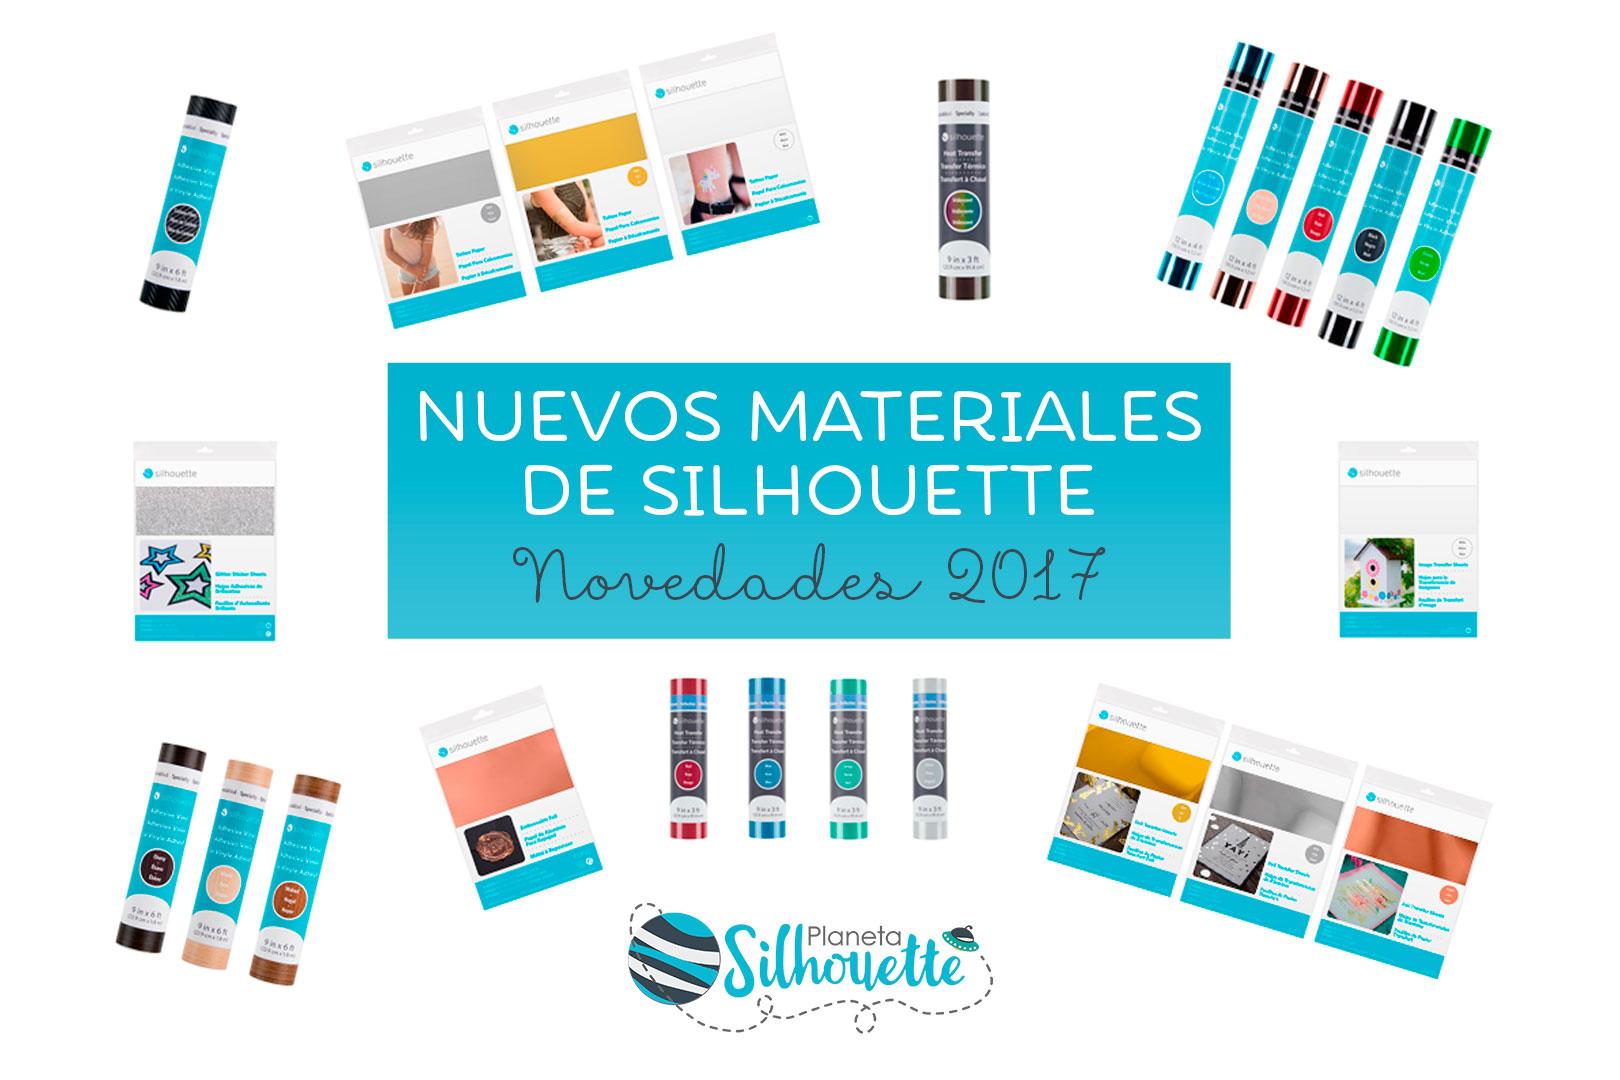 nuevosmaterialesSilhouette2017